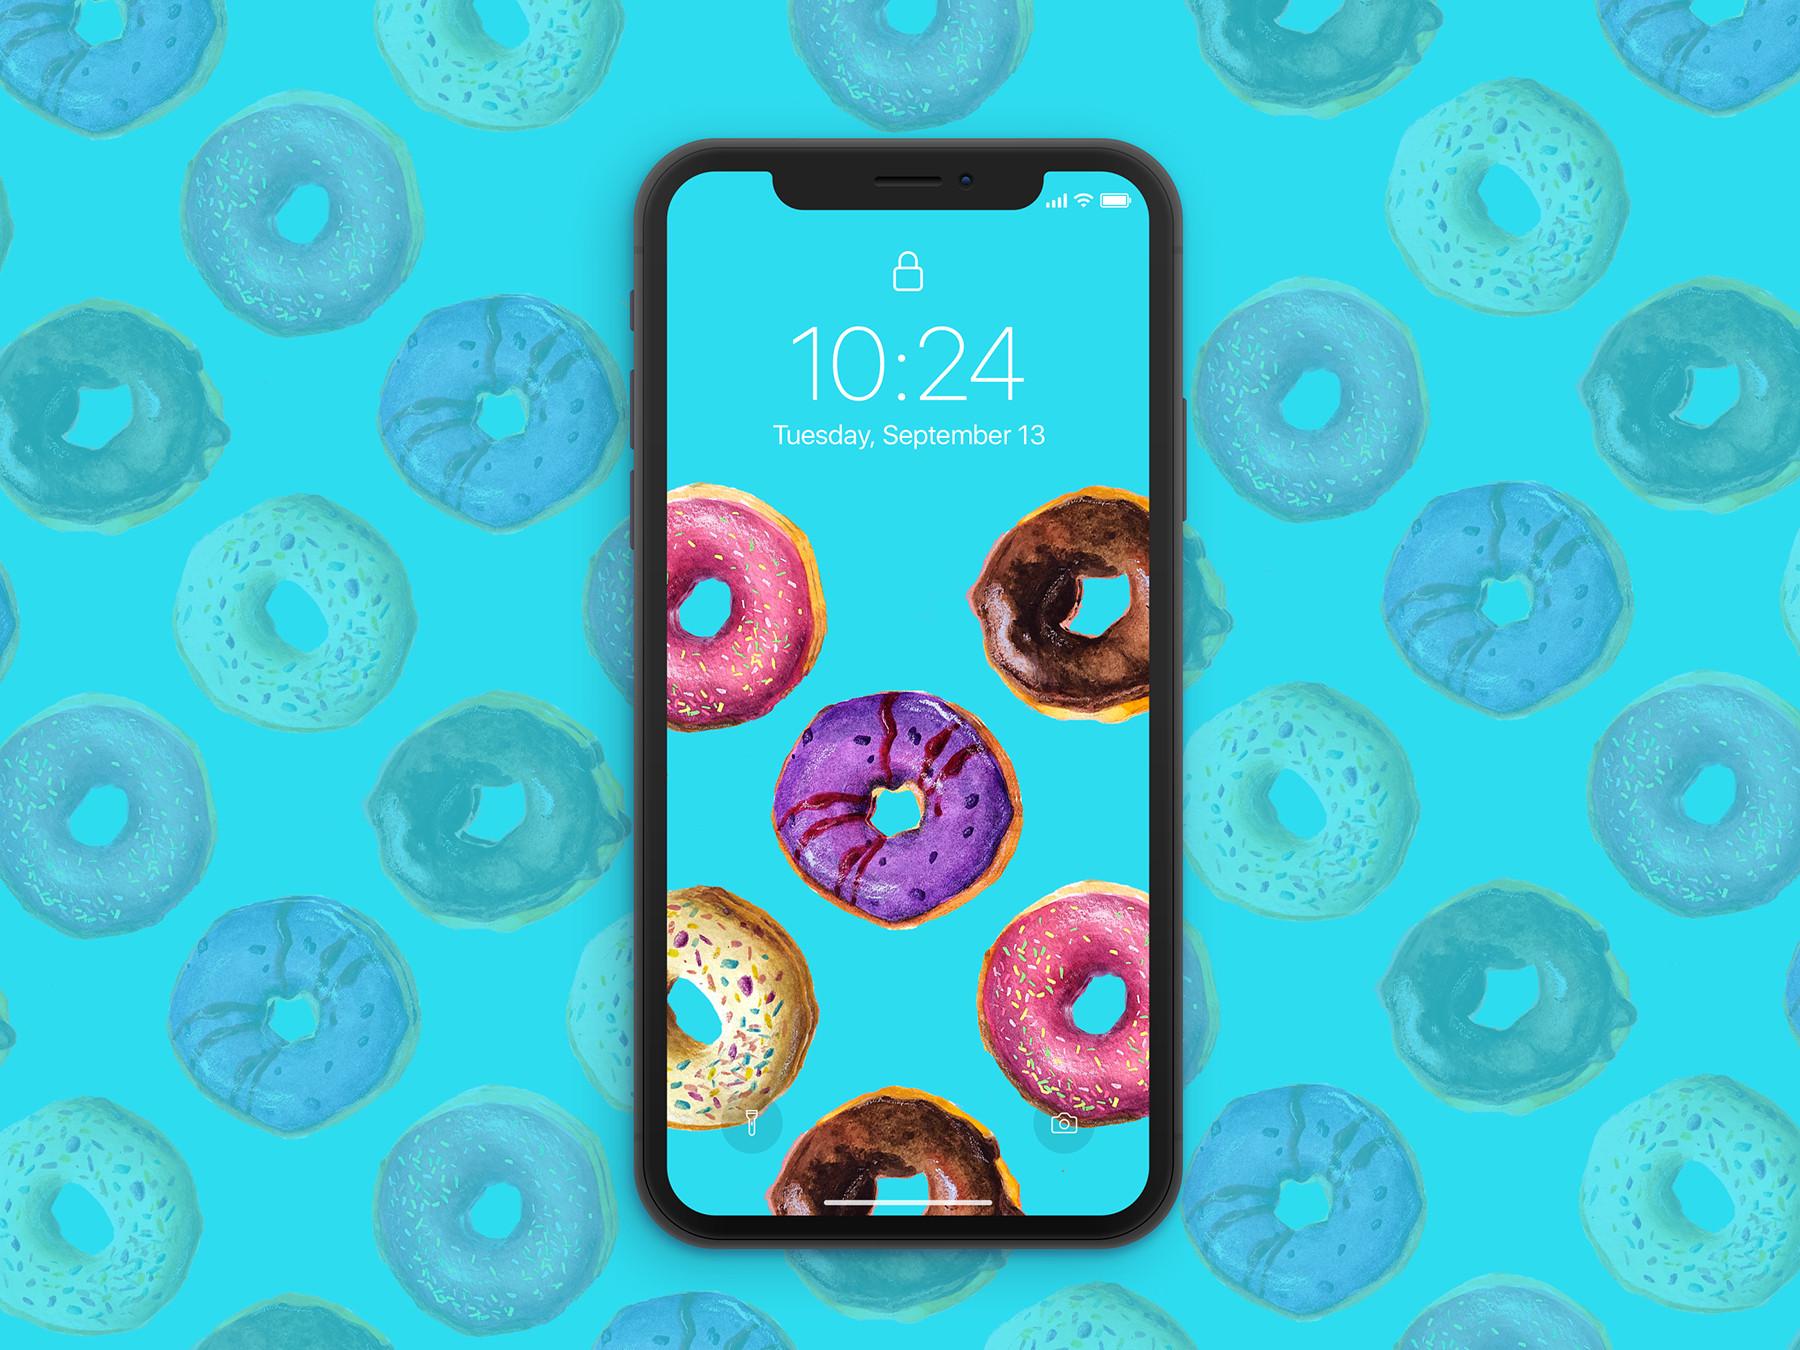 Doughnut pattern - iPhone 04.jpg